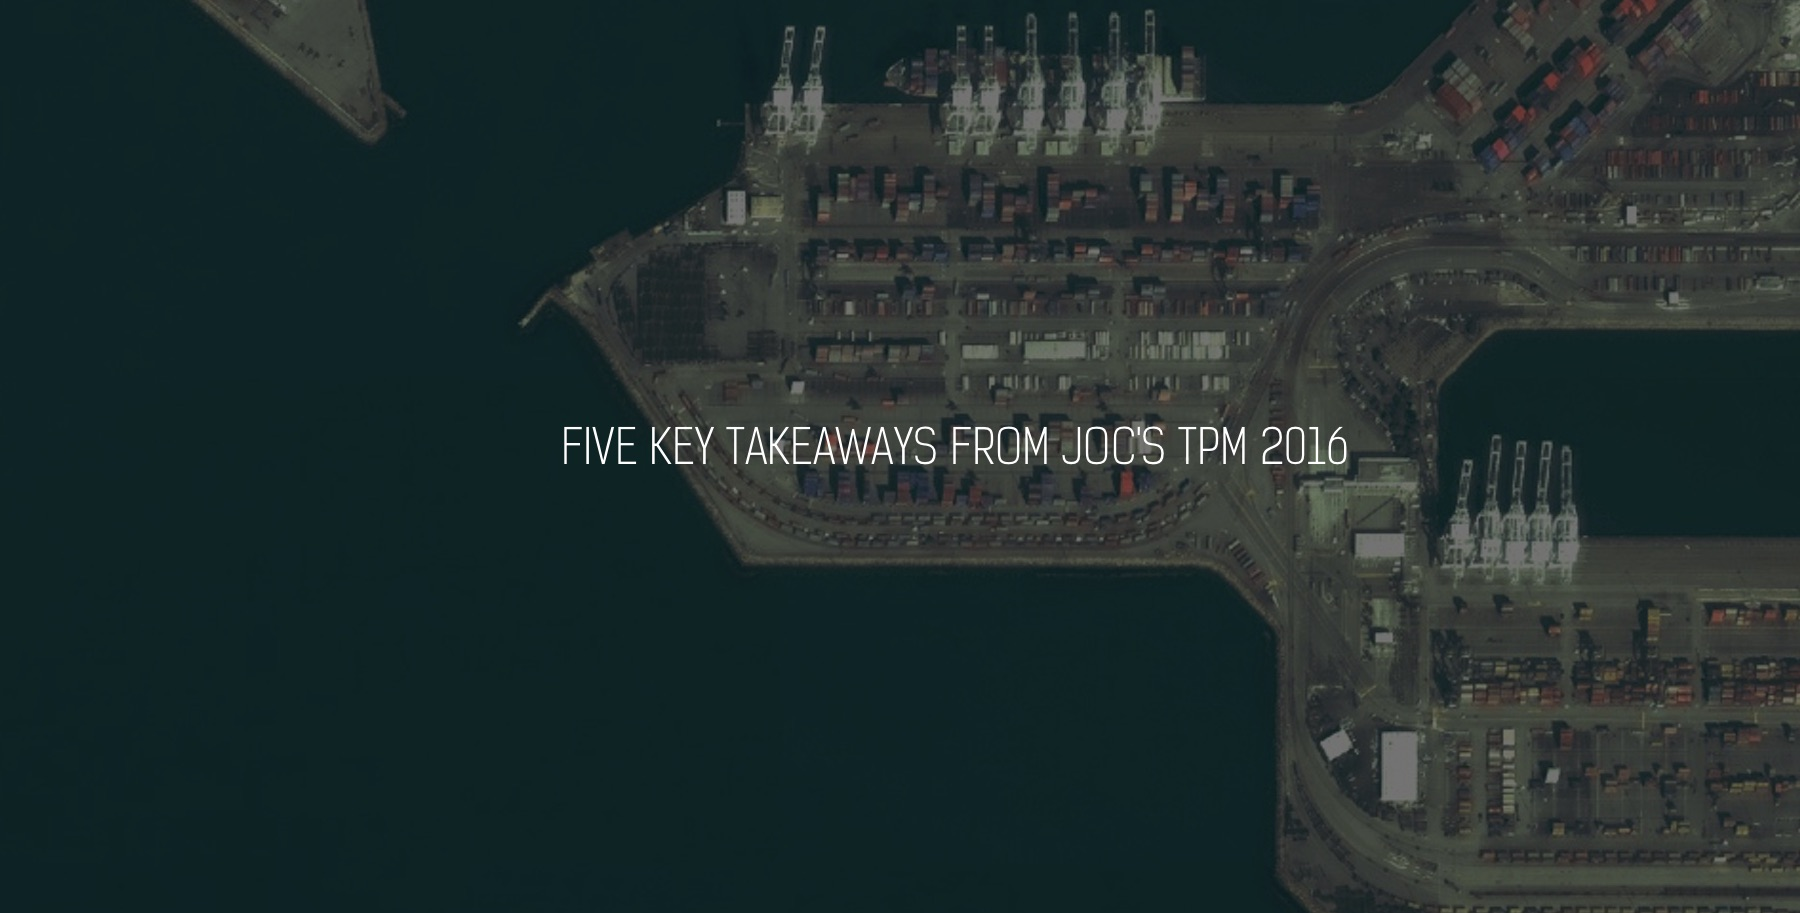 KEY TAKEAWAYS FROM TPM JOC 2016